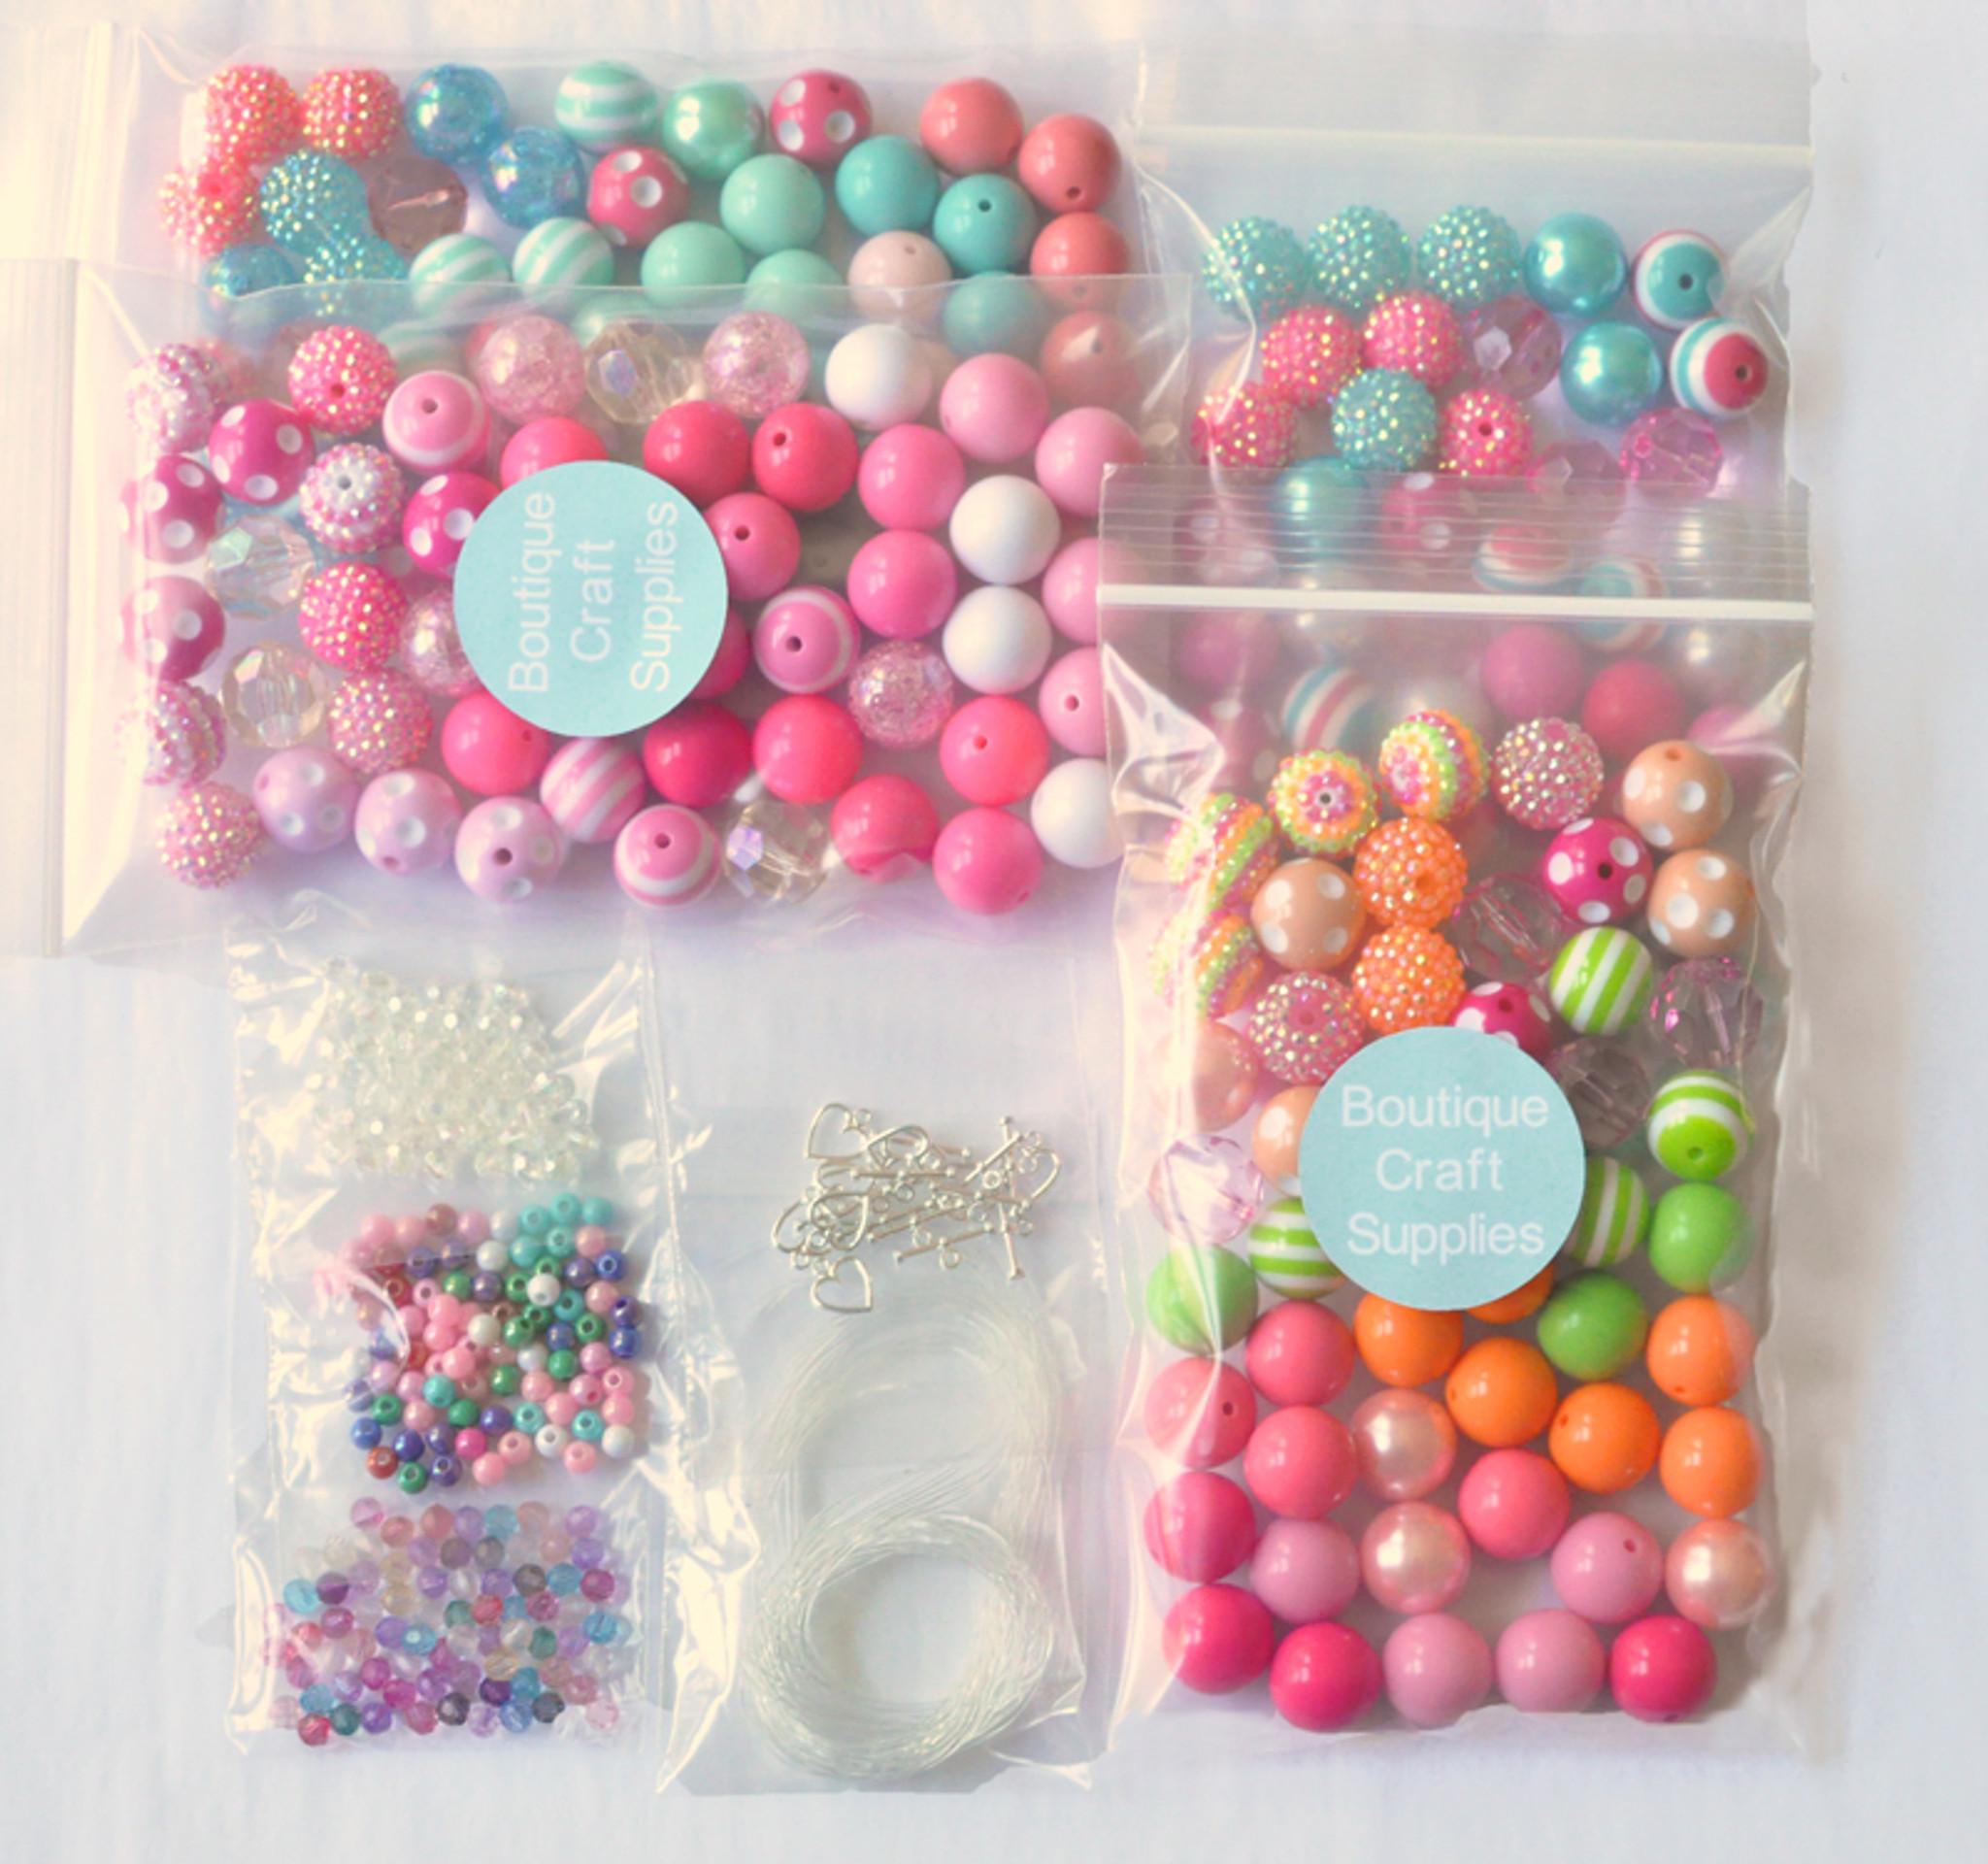 10 necklace bubblegum bead party kit for kids